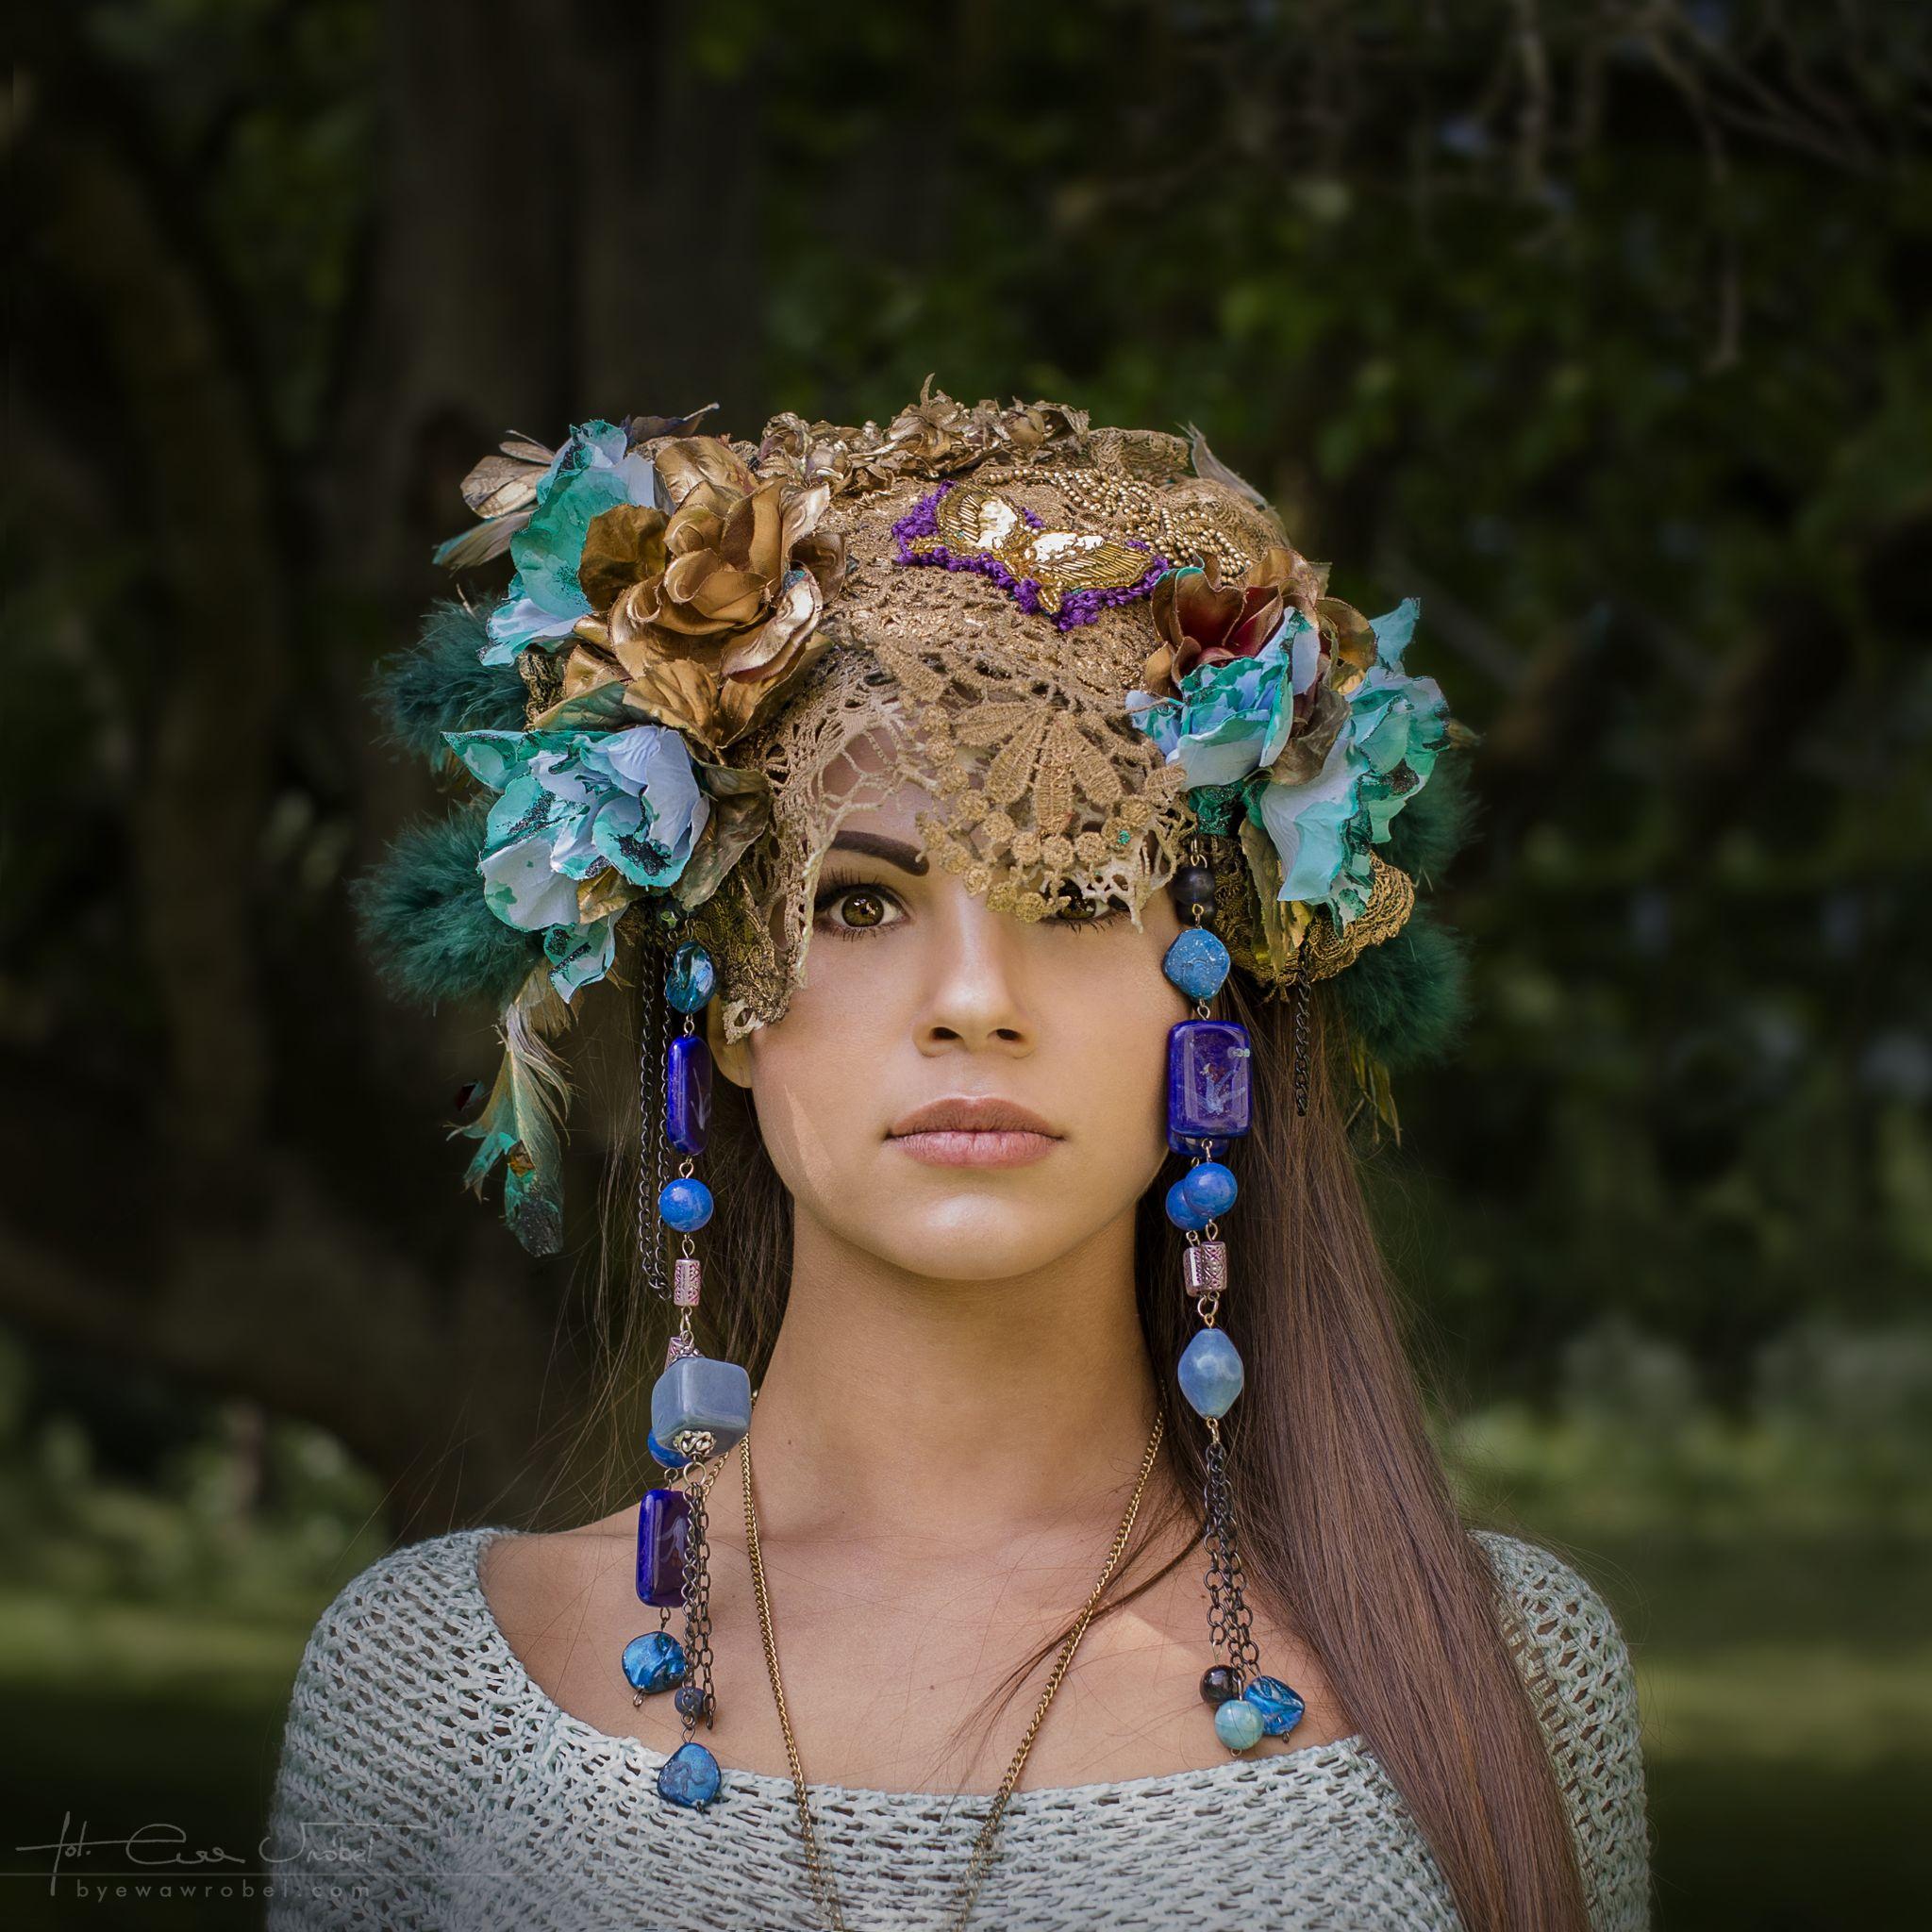 SHAMAN WOMAN by byewawrobel